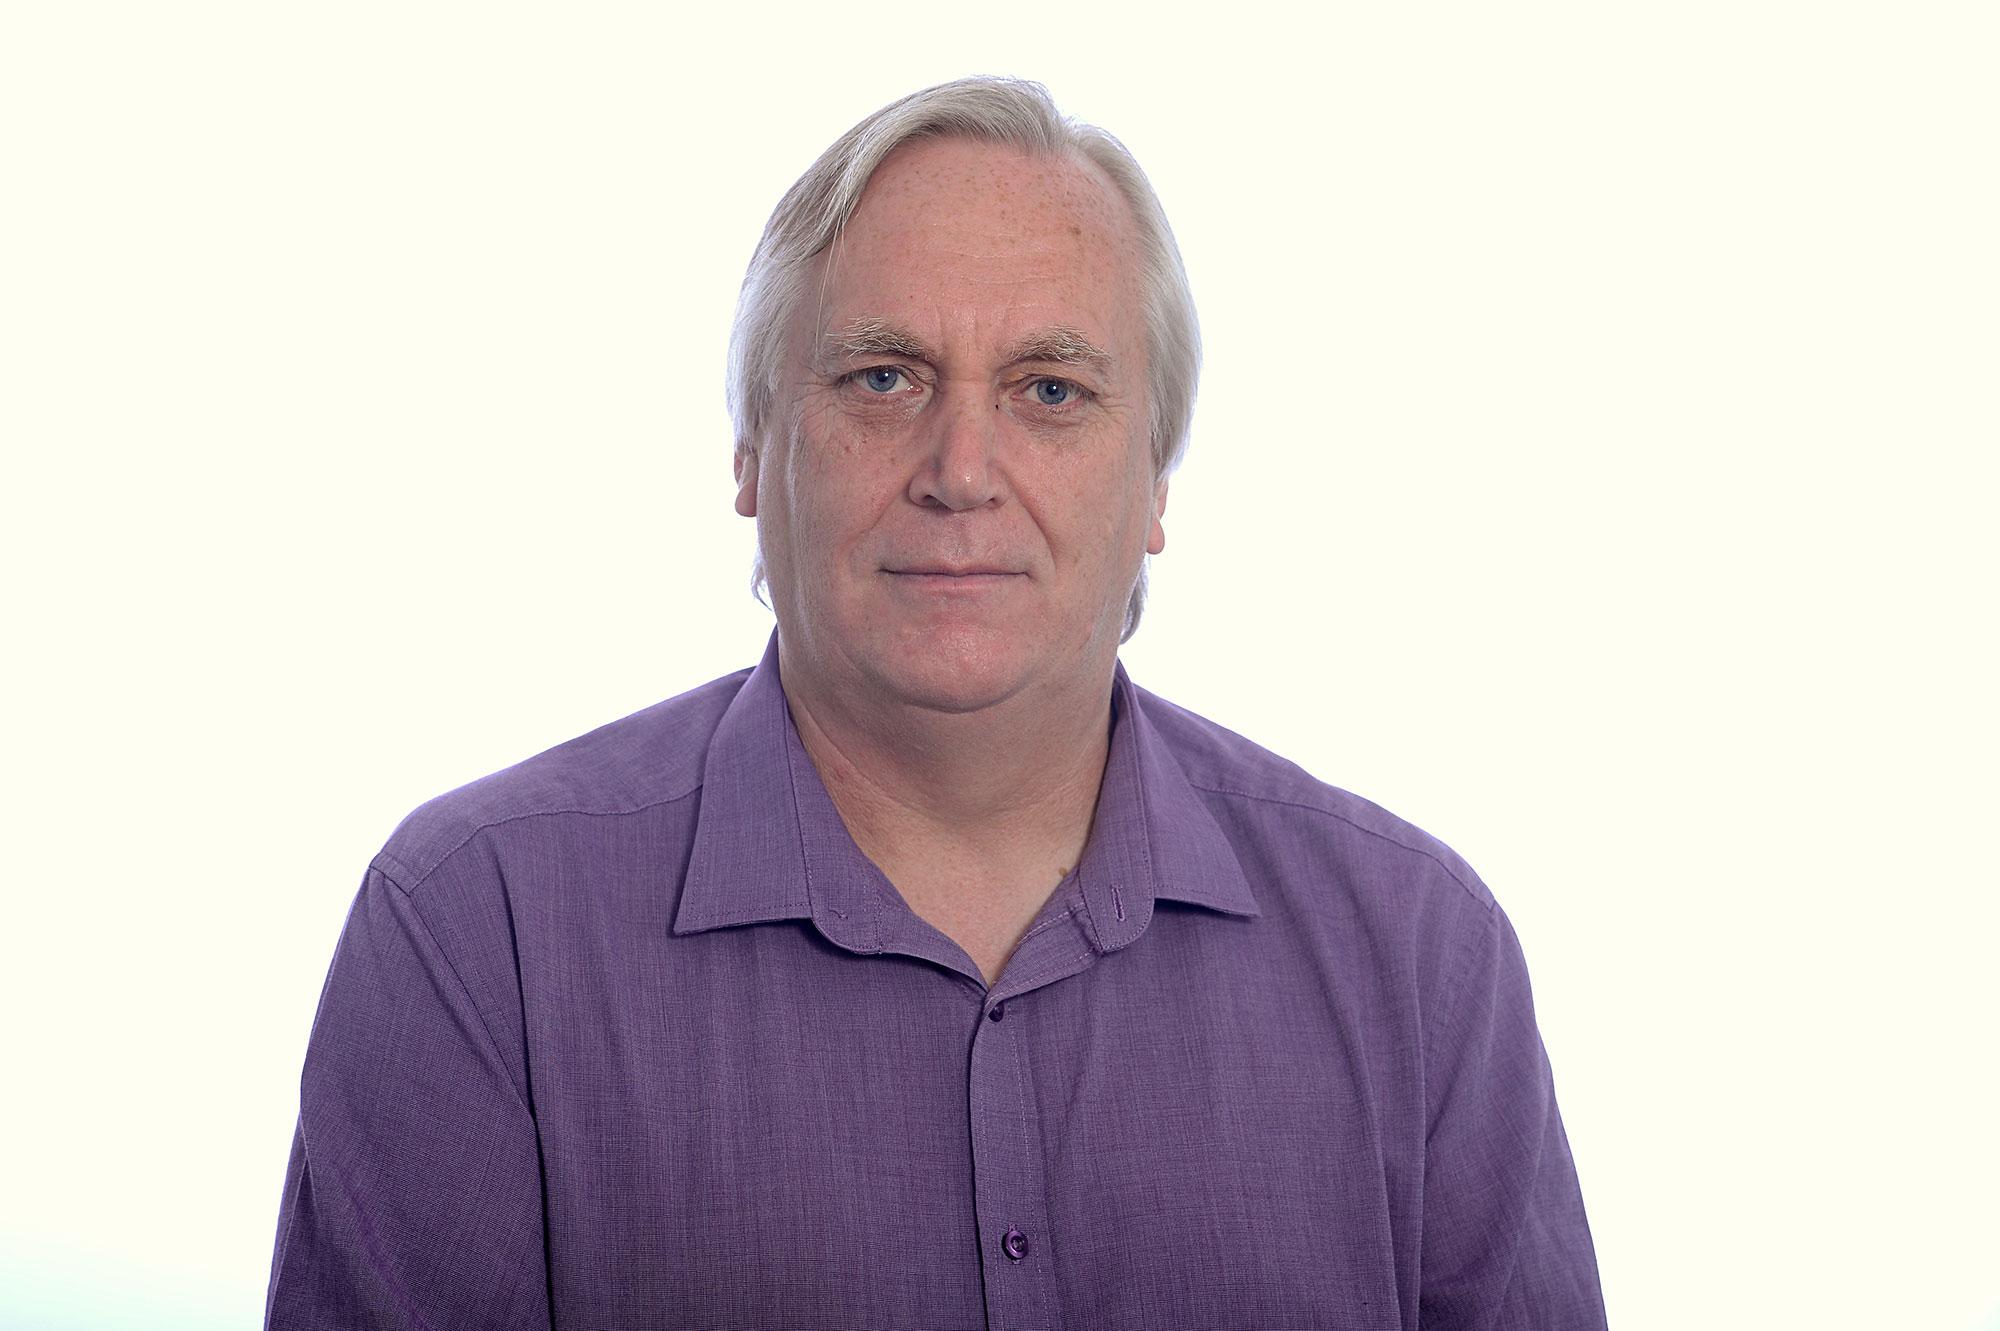 Lawrence Peachey